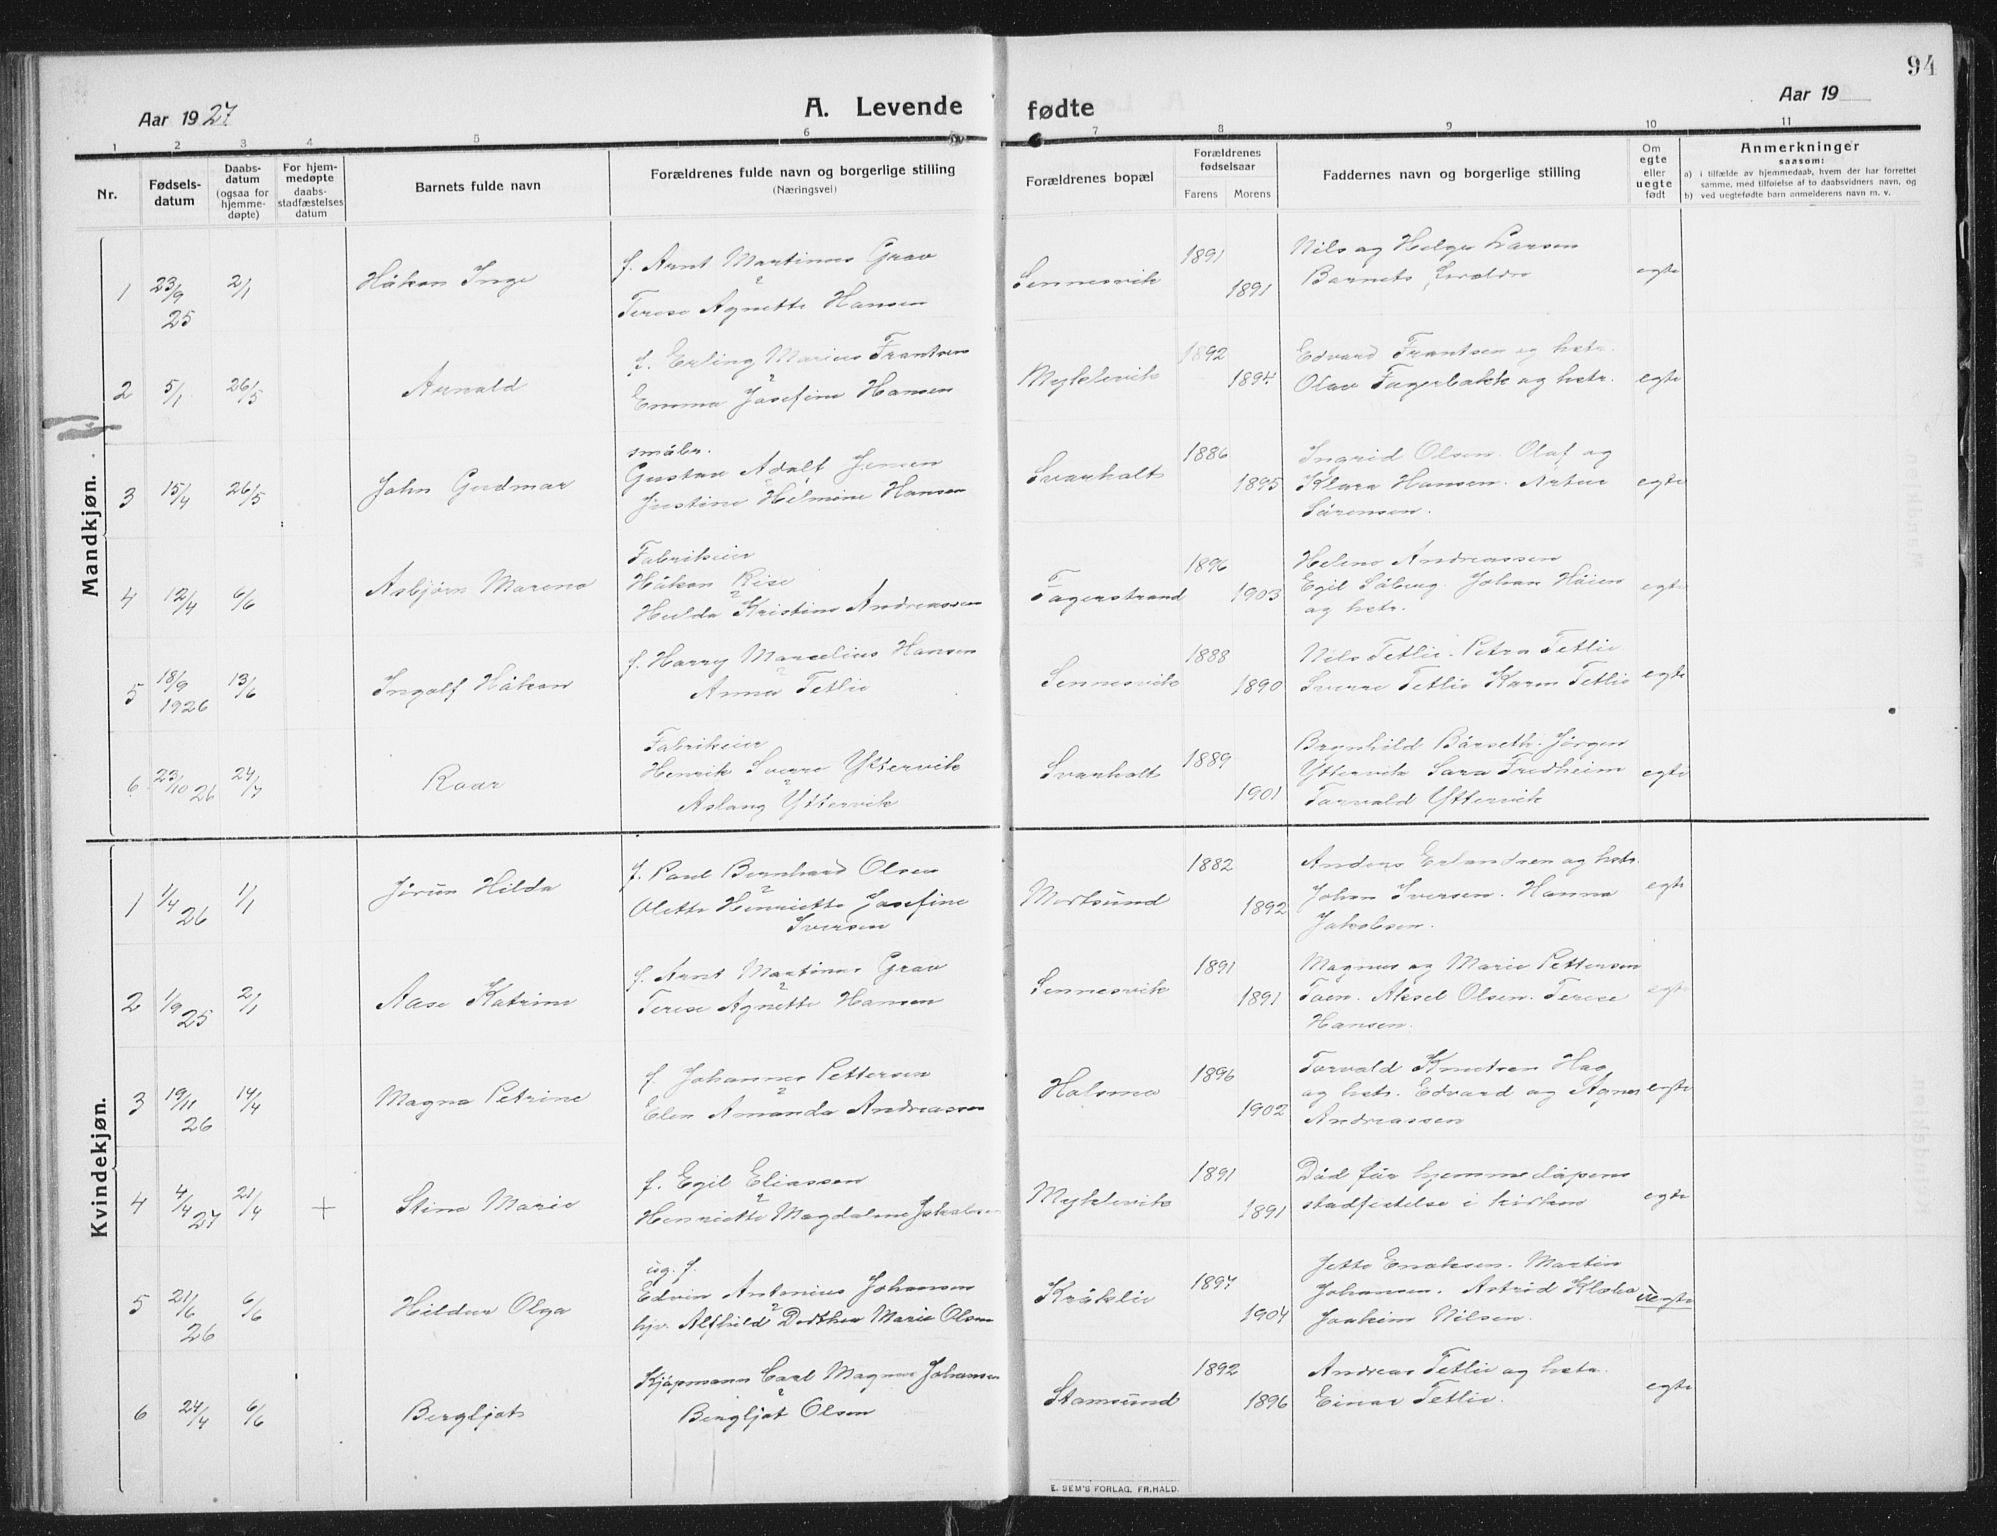 SAT, Ministerialprotokoller, klokkerbøker og fødselsregistre - Nordland, 882/L1183: Klokkerbok nr. 882C01, 1911-1938, s. 94